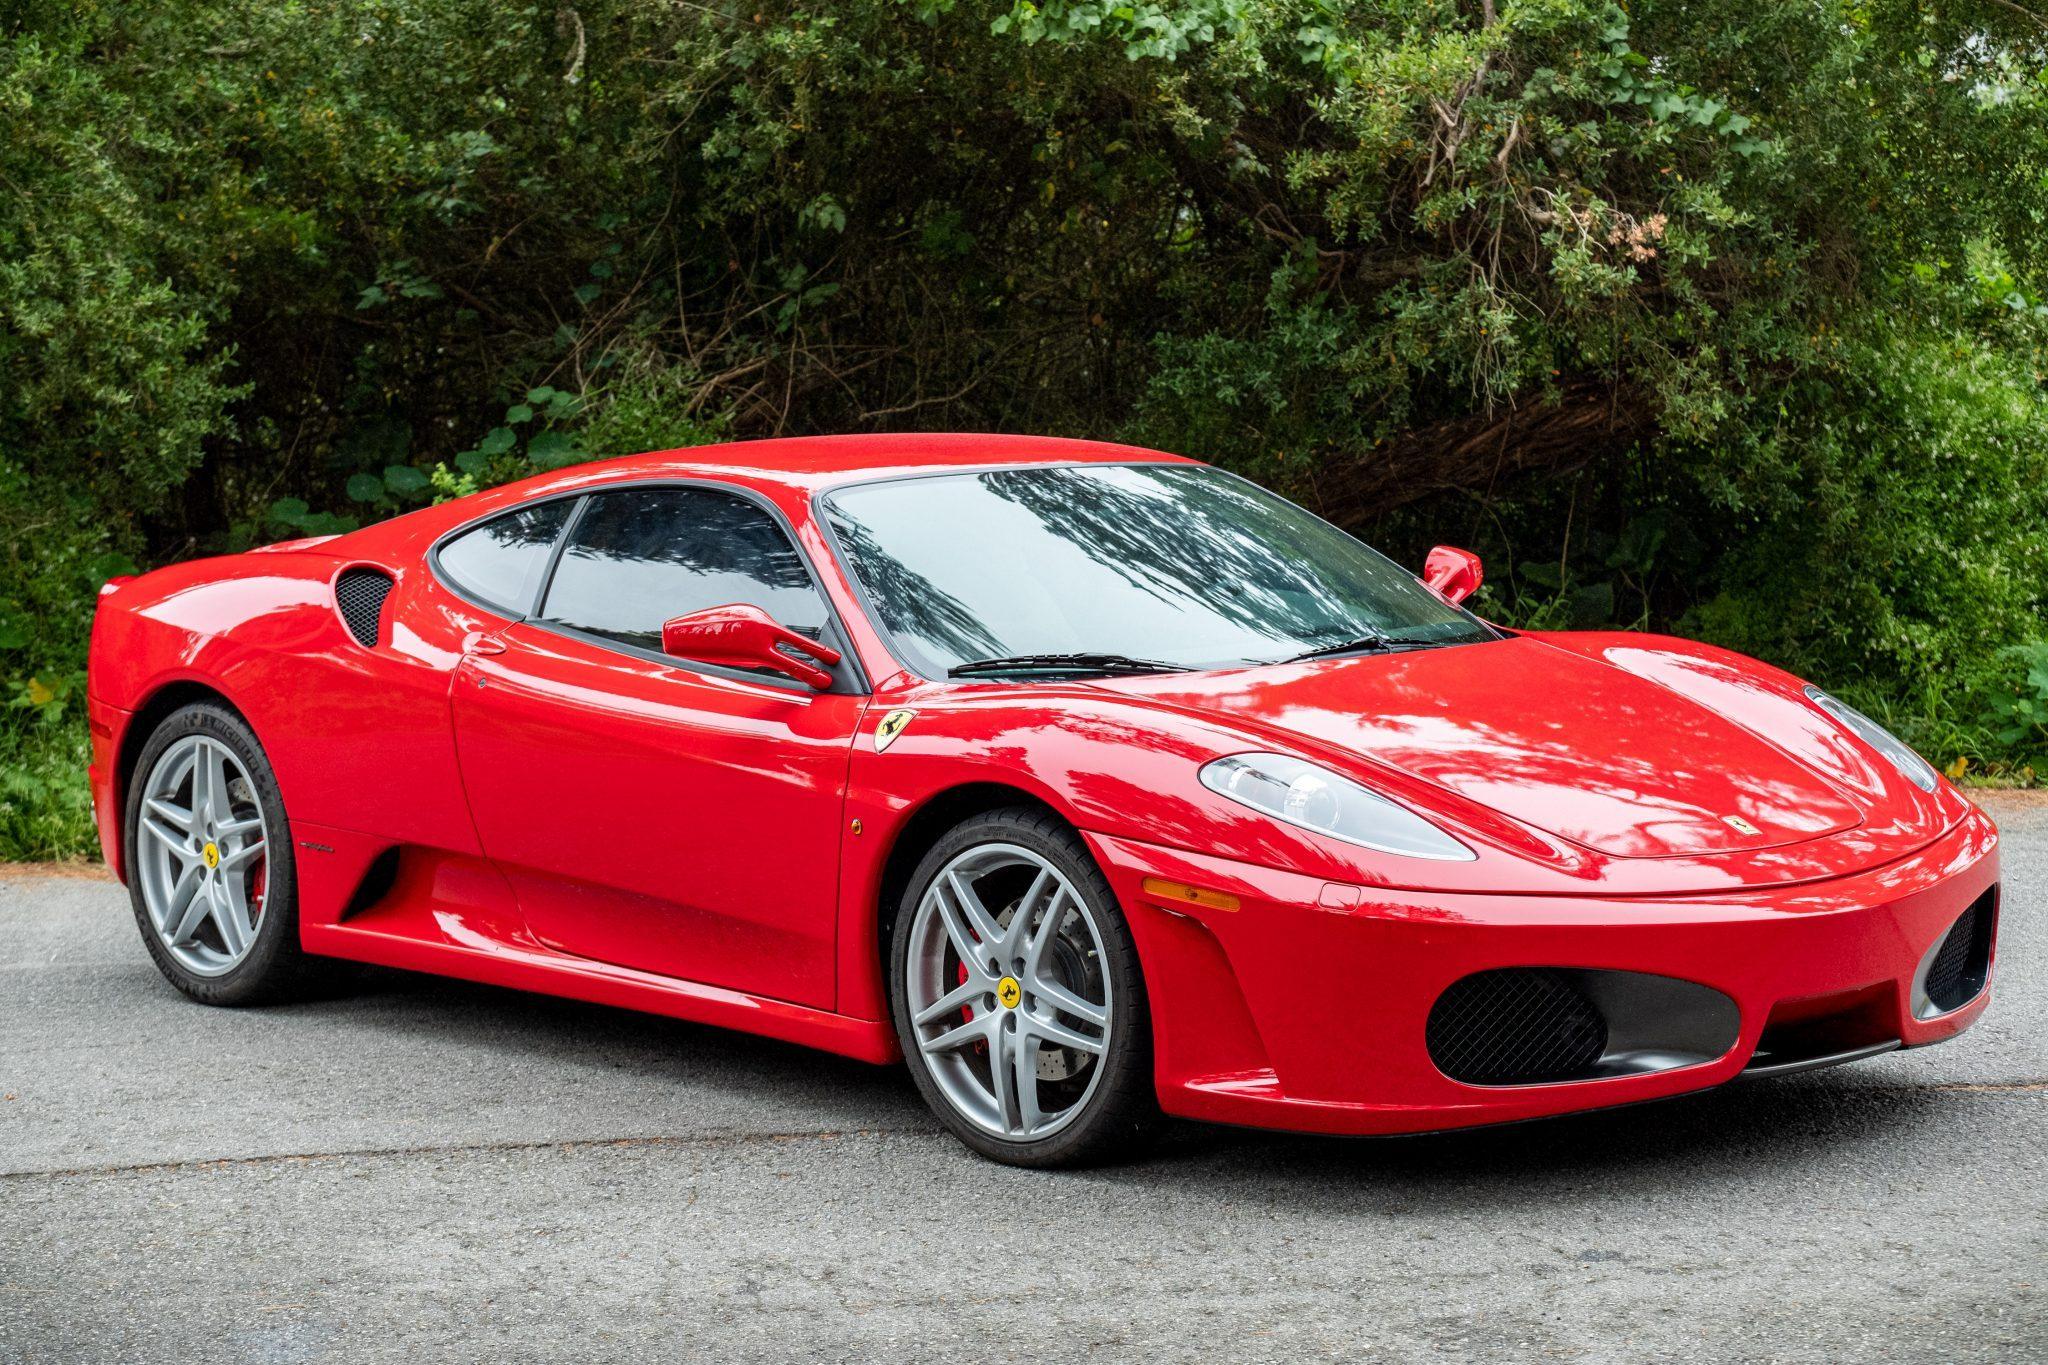 Ferrari F430 With Six-Speed Manual Is A True Petrolhead's Supercar |  Carscoops